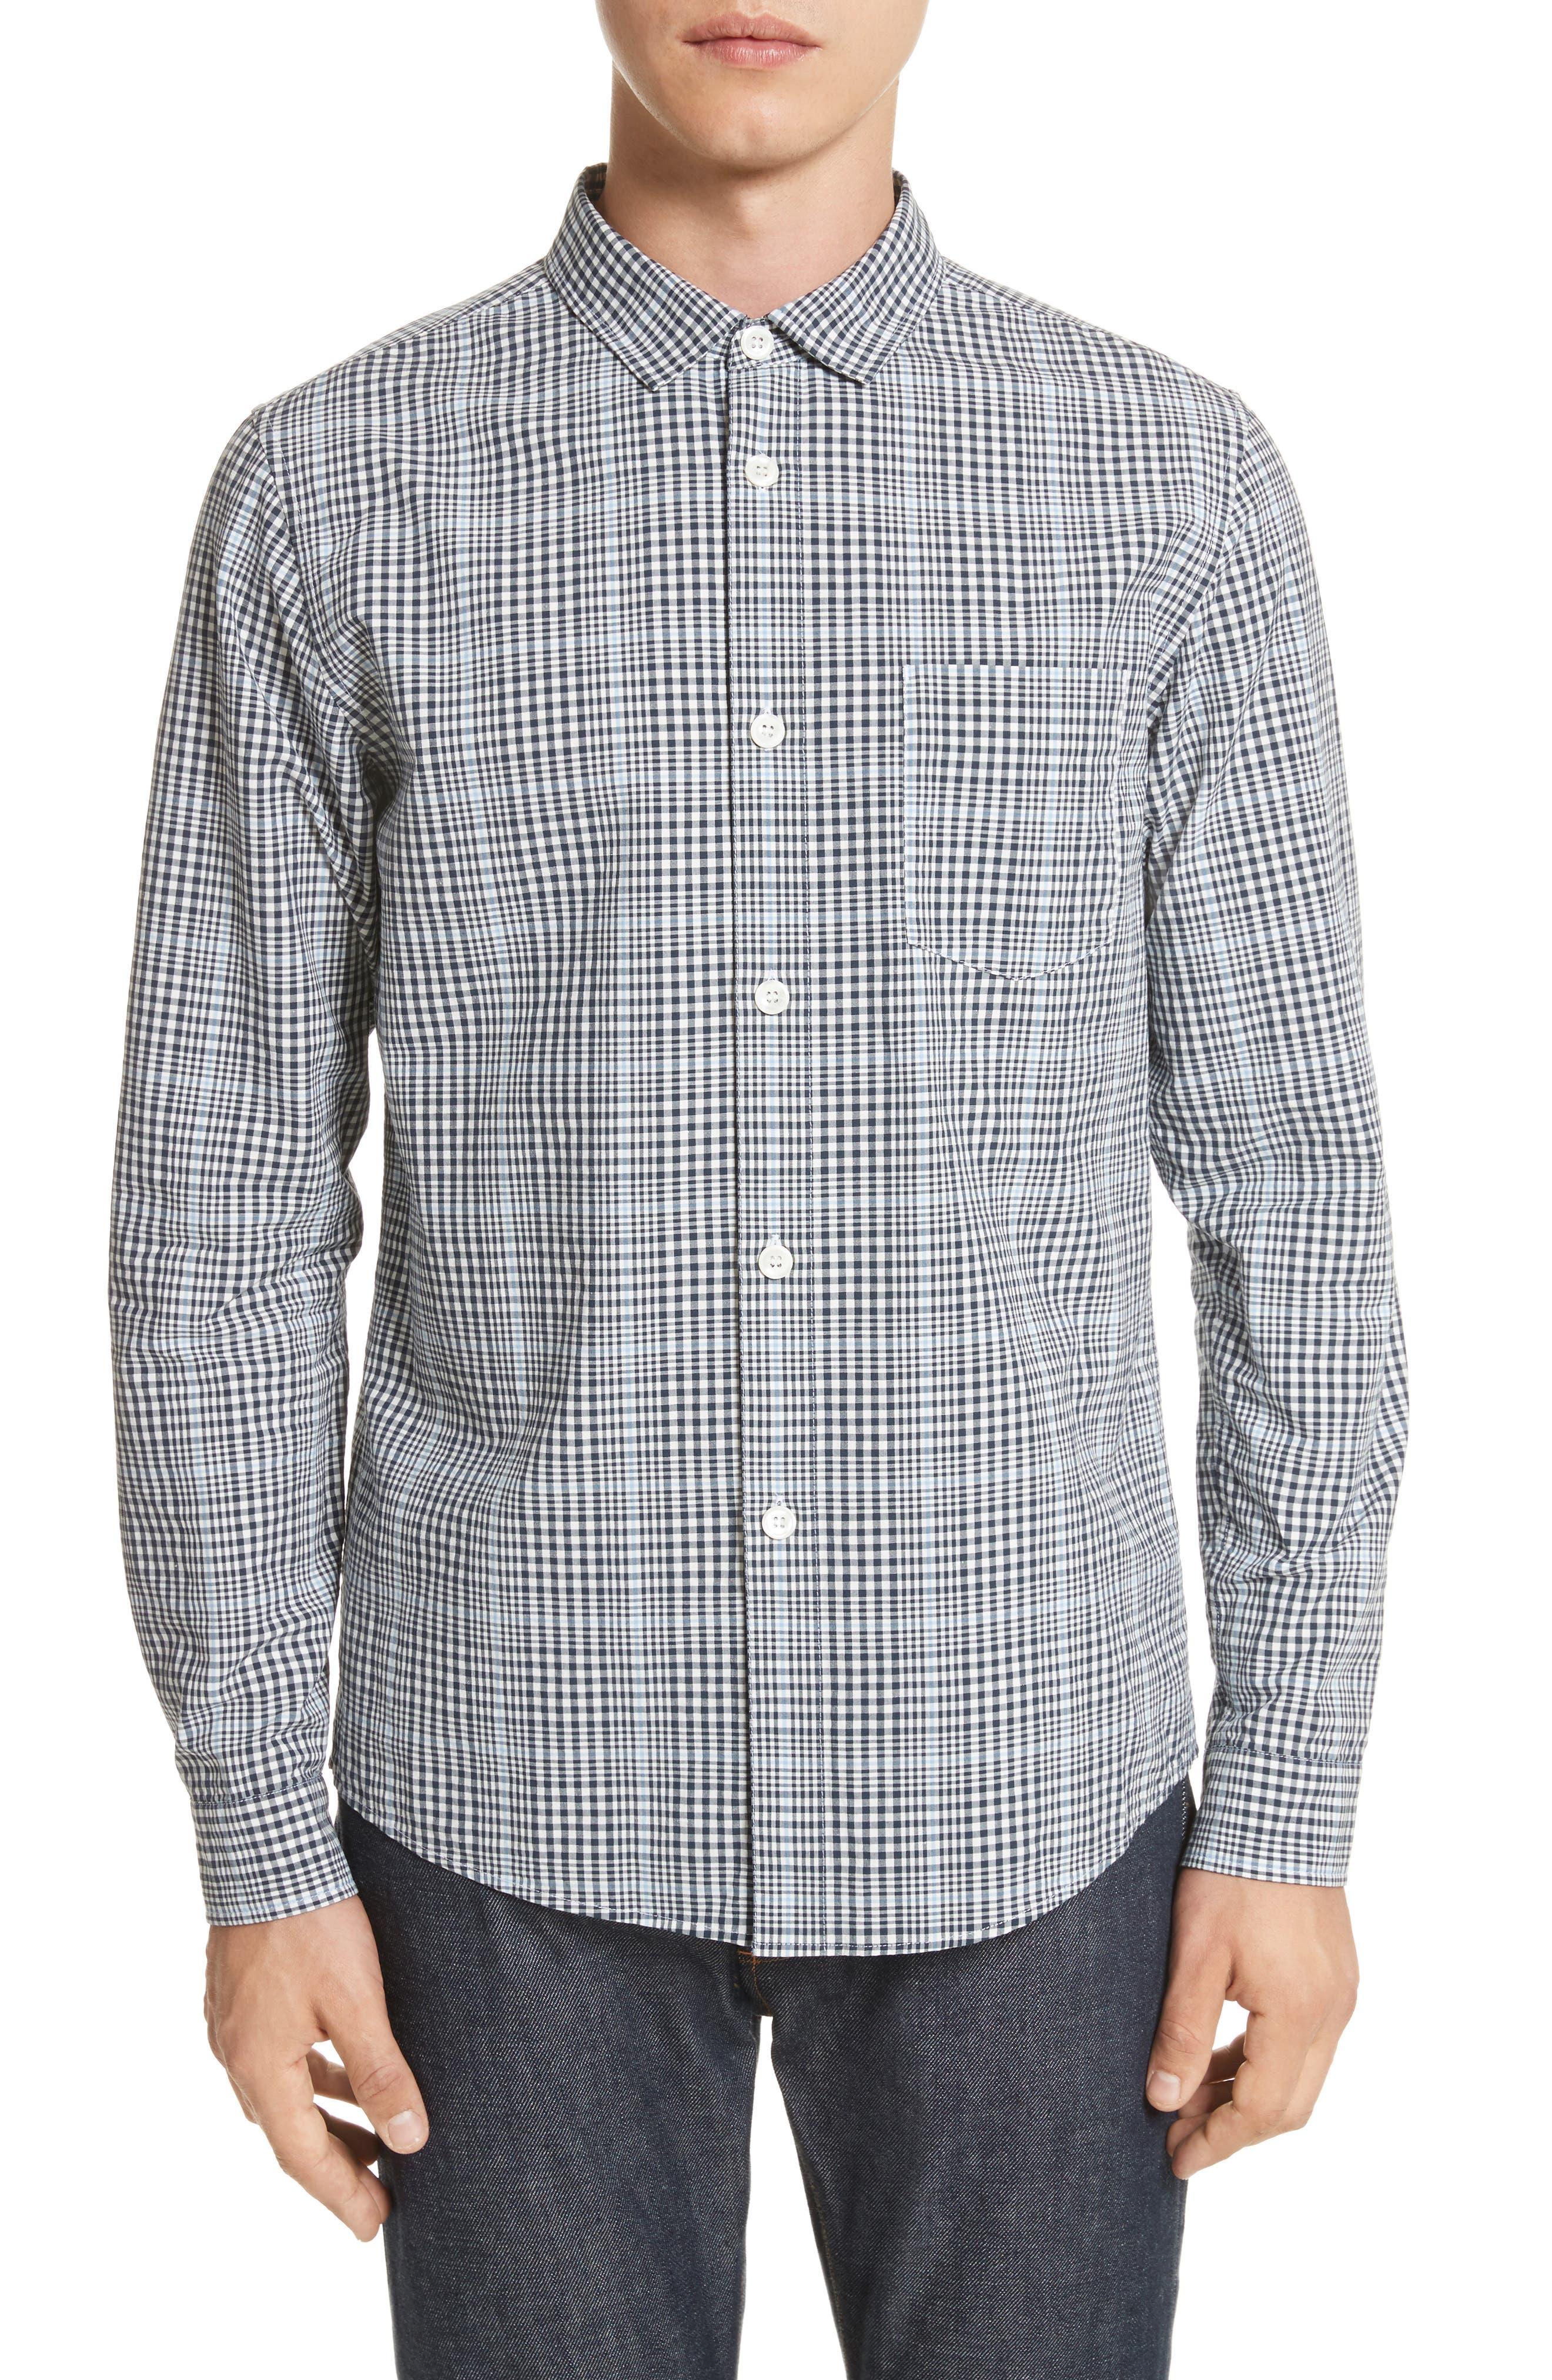 John Check Woven Shirt,                         Main,                         color, 410